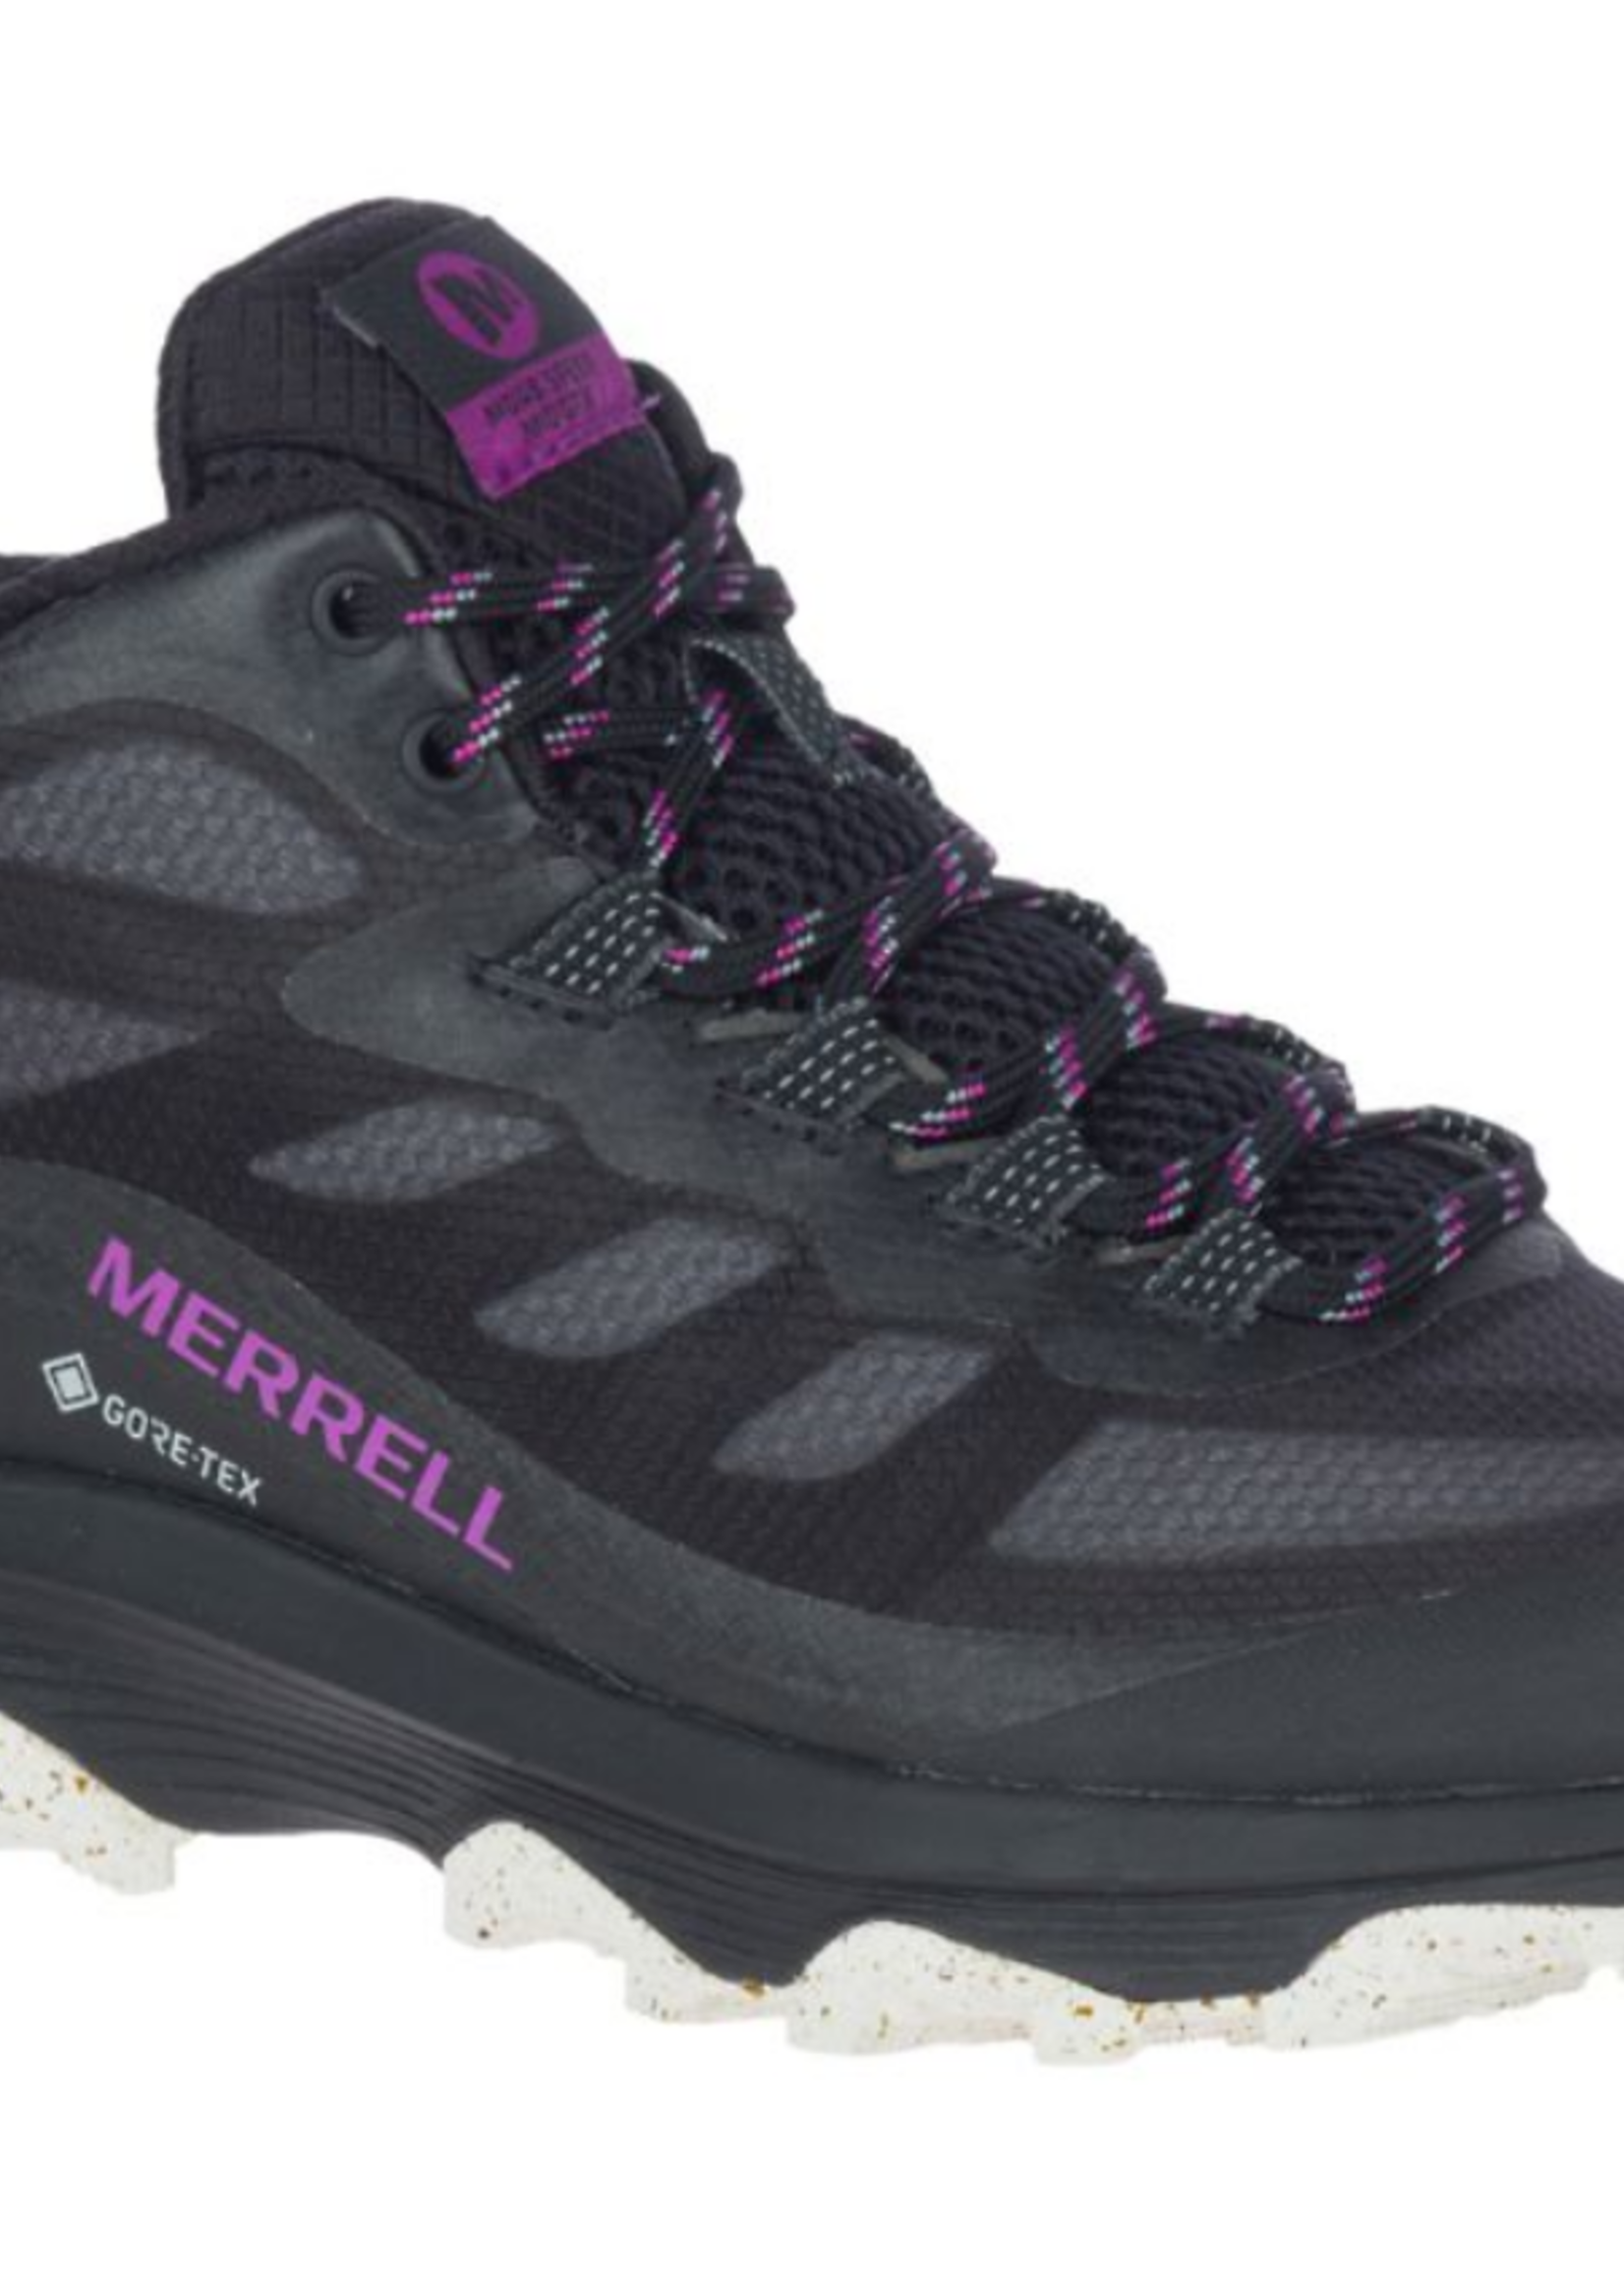 Merrell MOAB SPEED MID GTX J135414